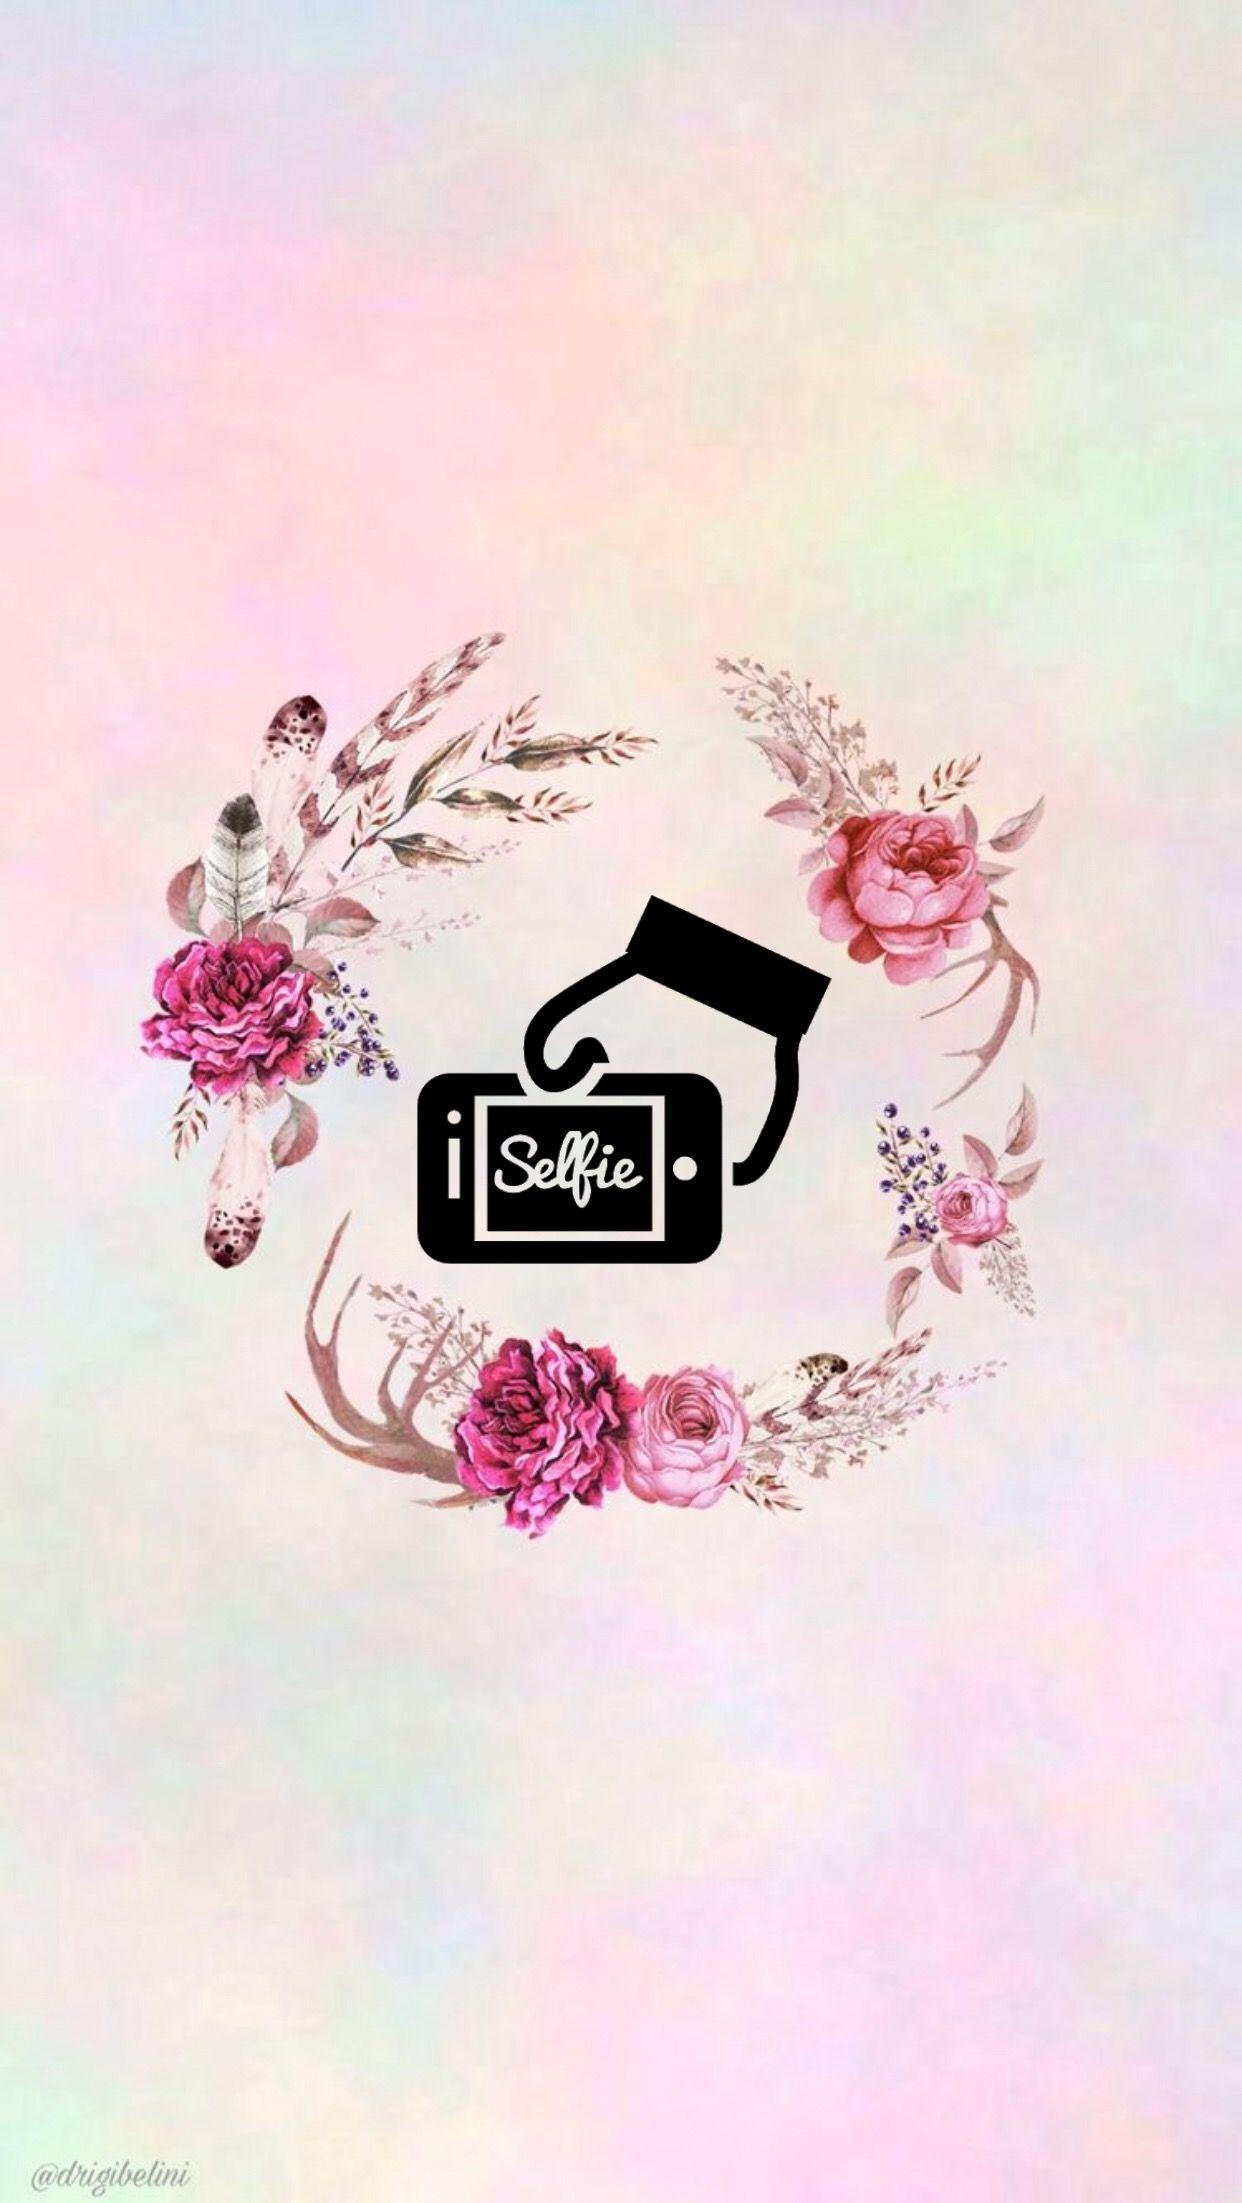 Pin de Patricia Kelly em wallpapers lindos Logotipo